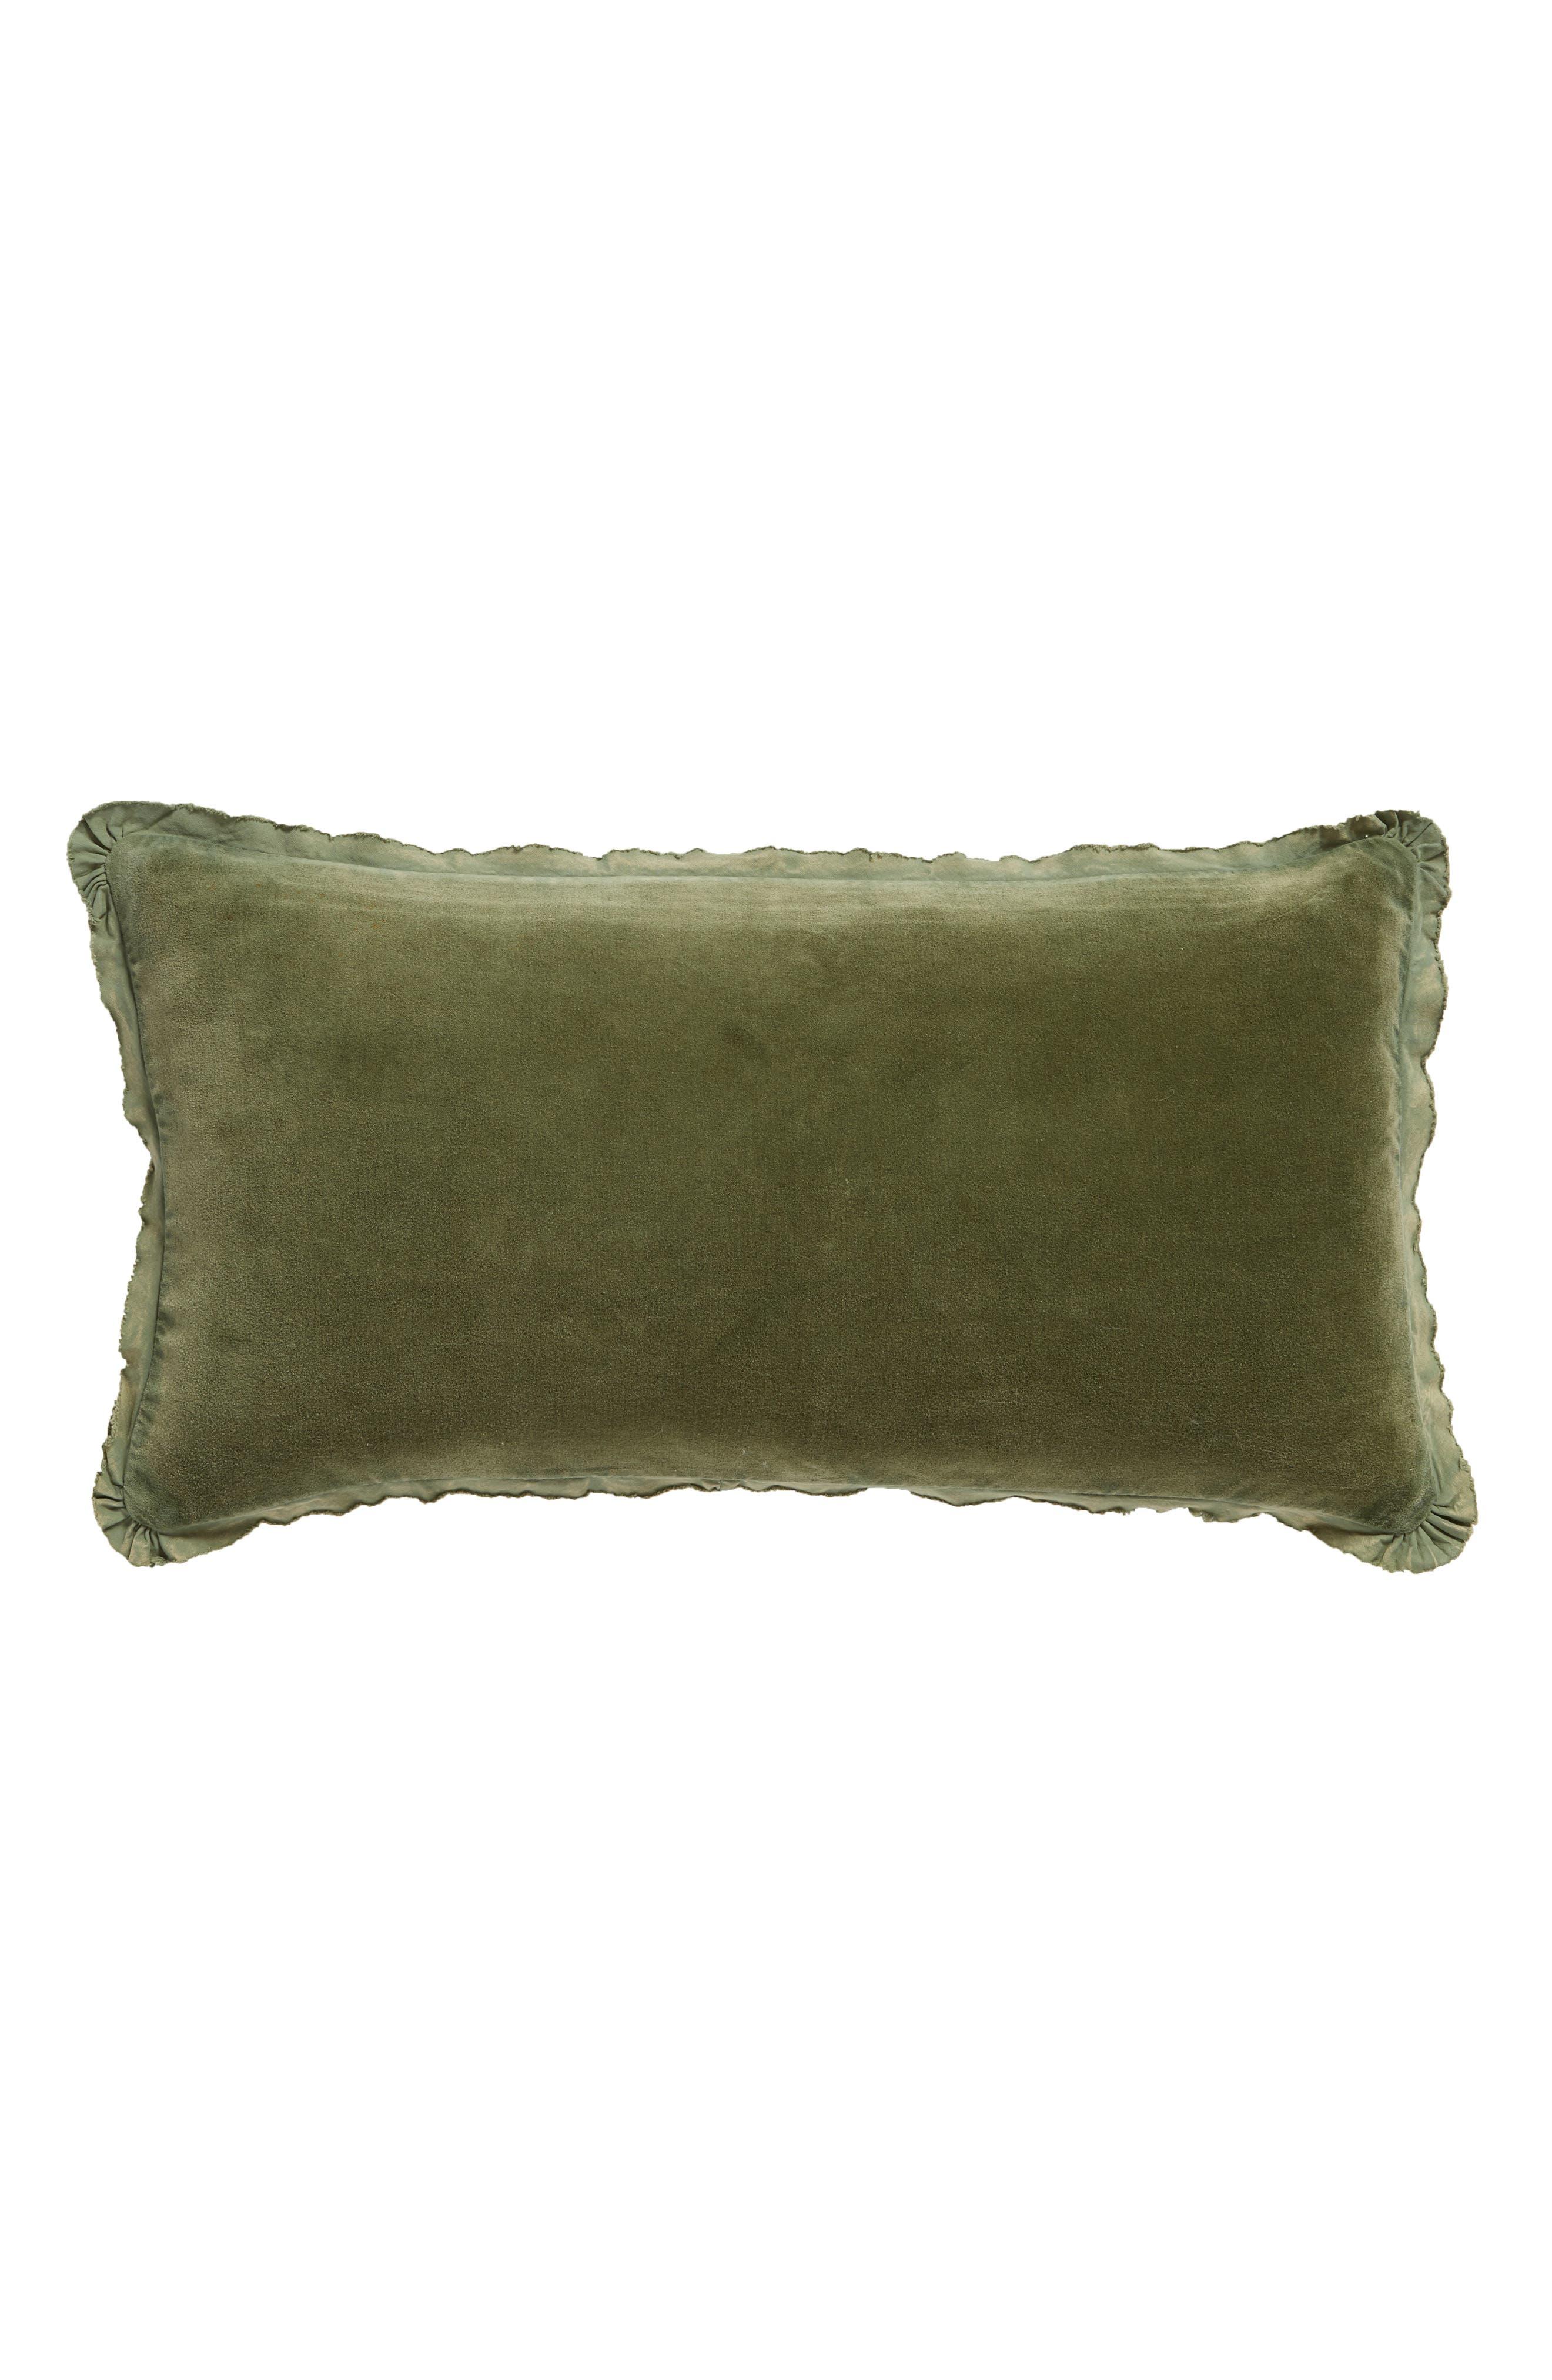 TREASURE & BOND, Velvet Accent Pillow, Main thumbnail 1, color, GREEN SORREL